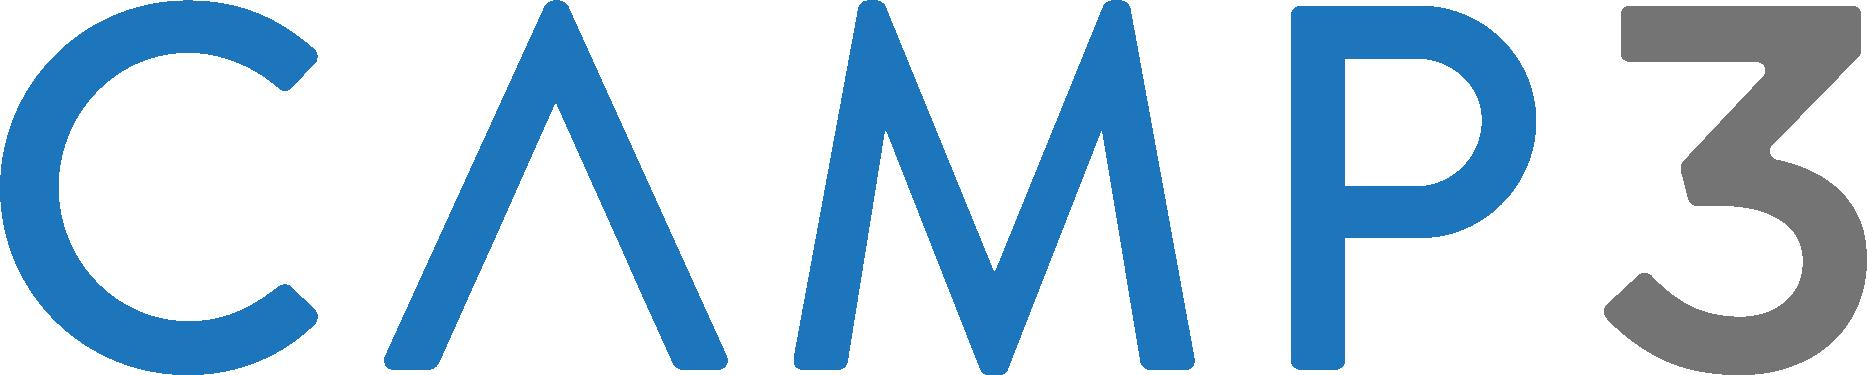 camp3_logo.png